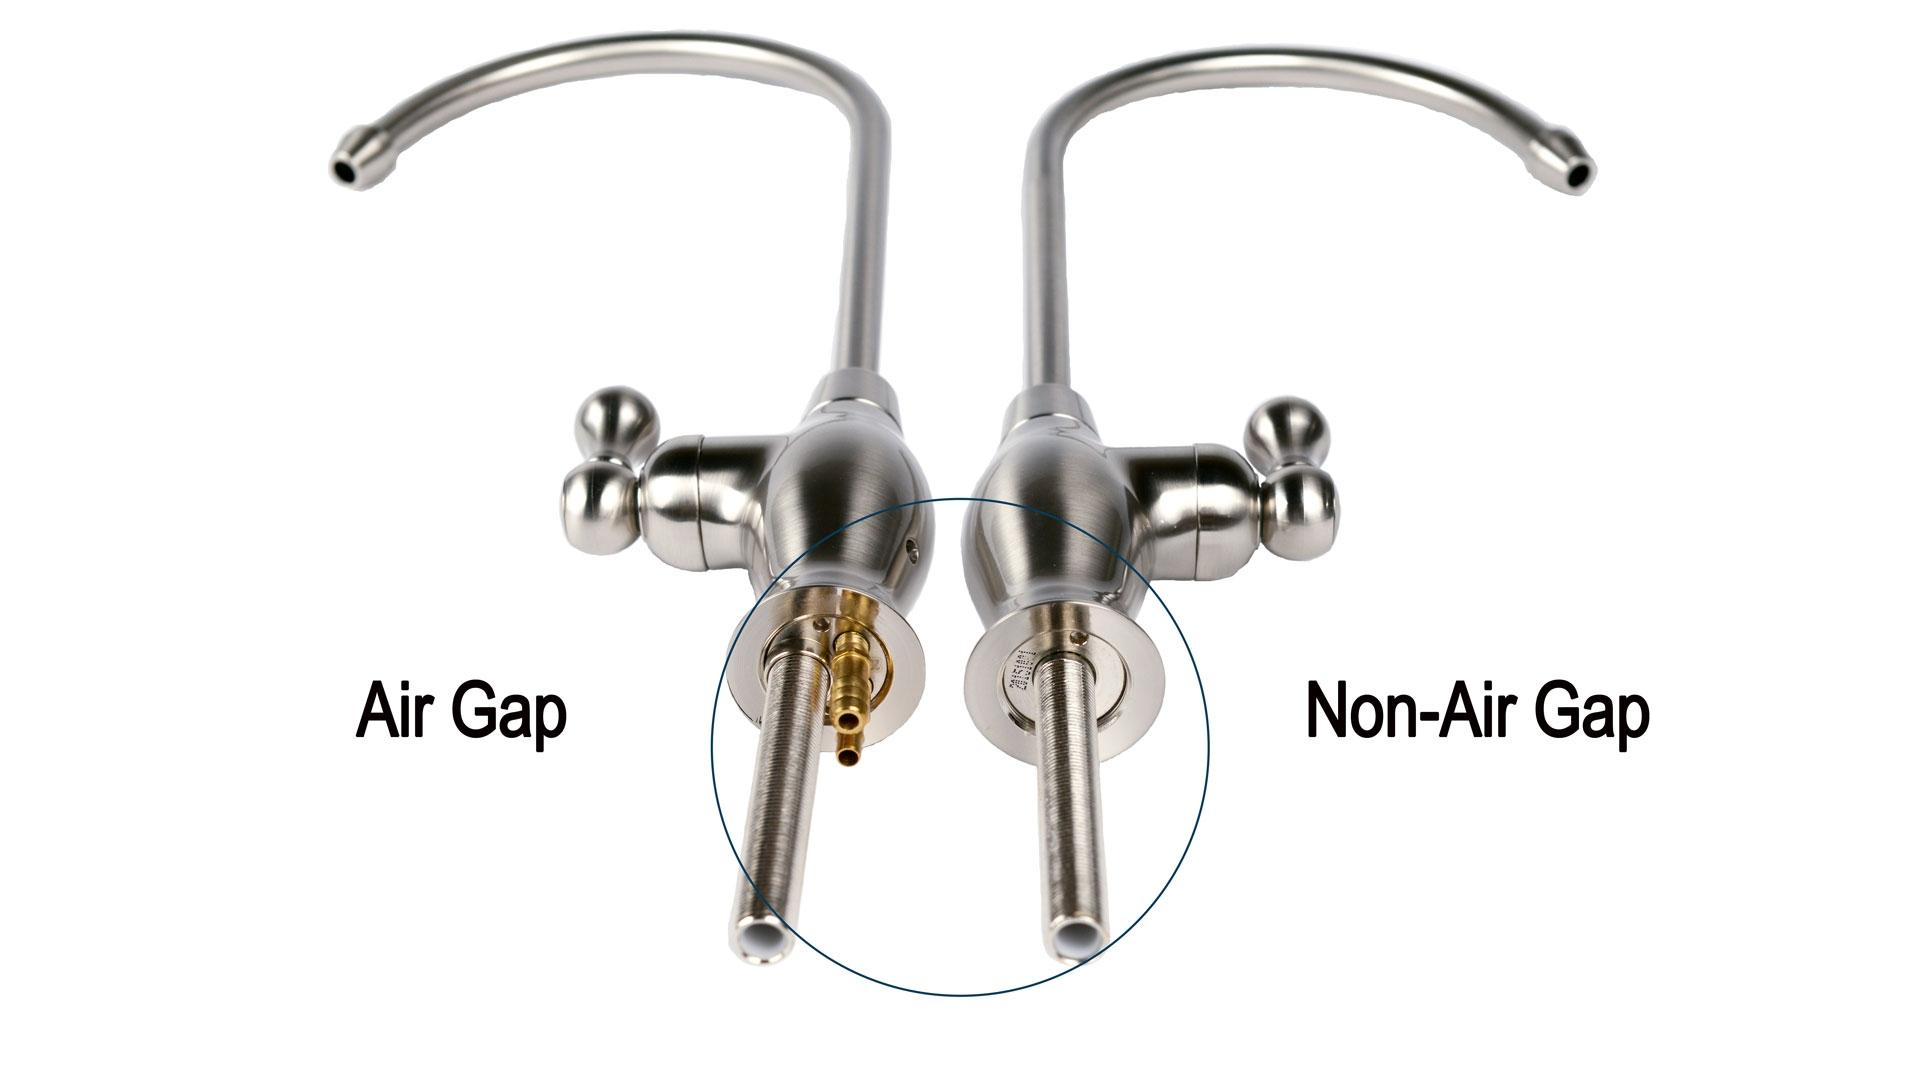 culligan air gap faucet for reverse osmosis system culligan air gap faucet for reverse osmosis system air gap vs non air gap faucet esp water products 1920 x 1081